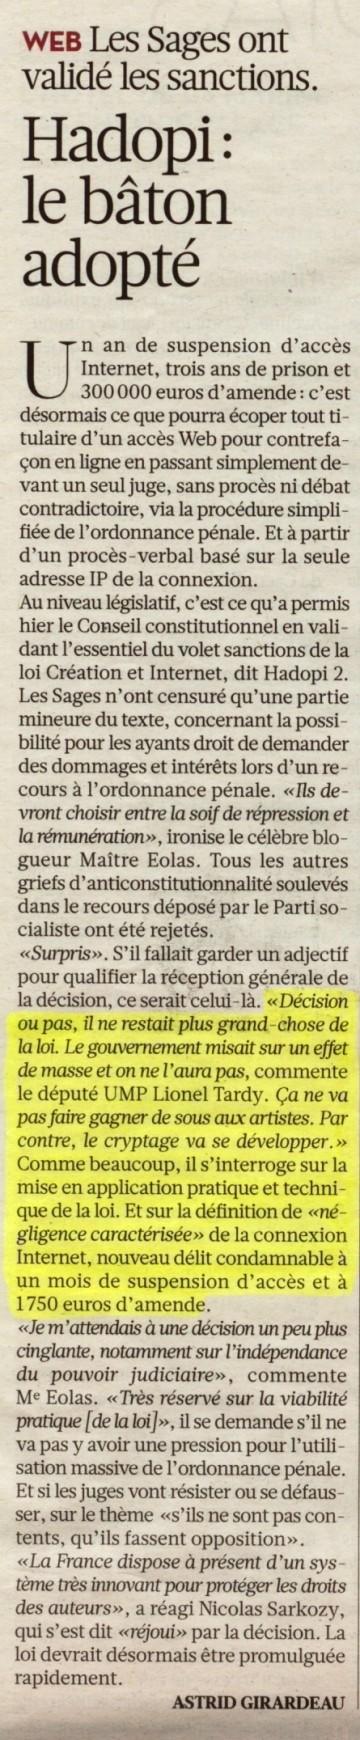 09 - 23oct09 Libération.jpg